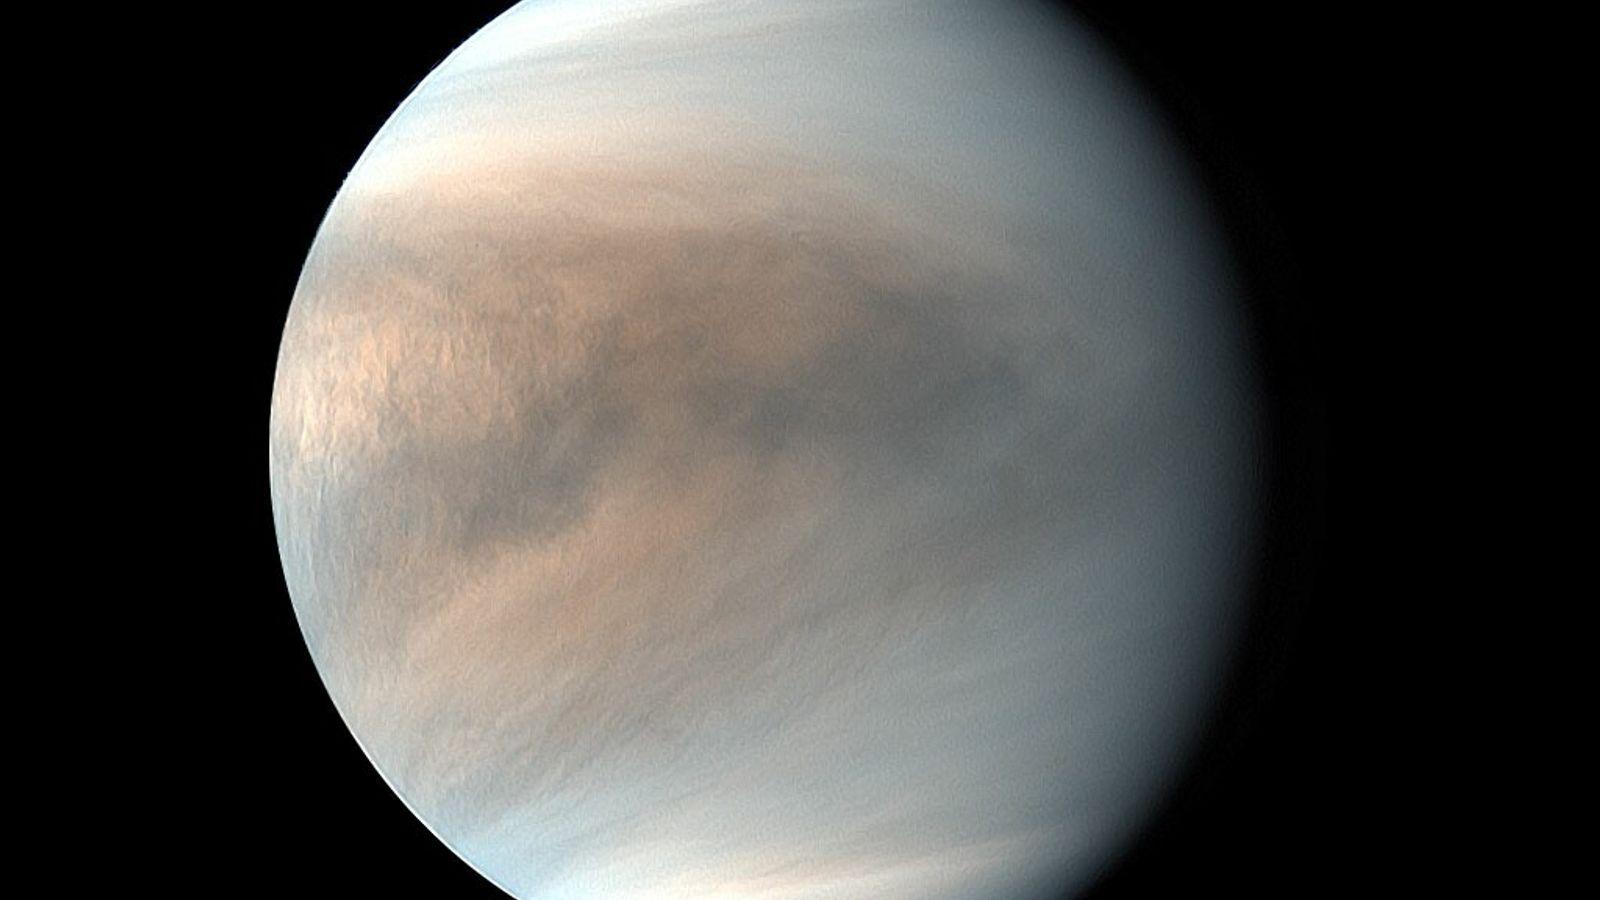 A false color image of Venus taken in ultraviolet light by Japan's Akatsuki spacecraft, revealing patterns ...